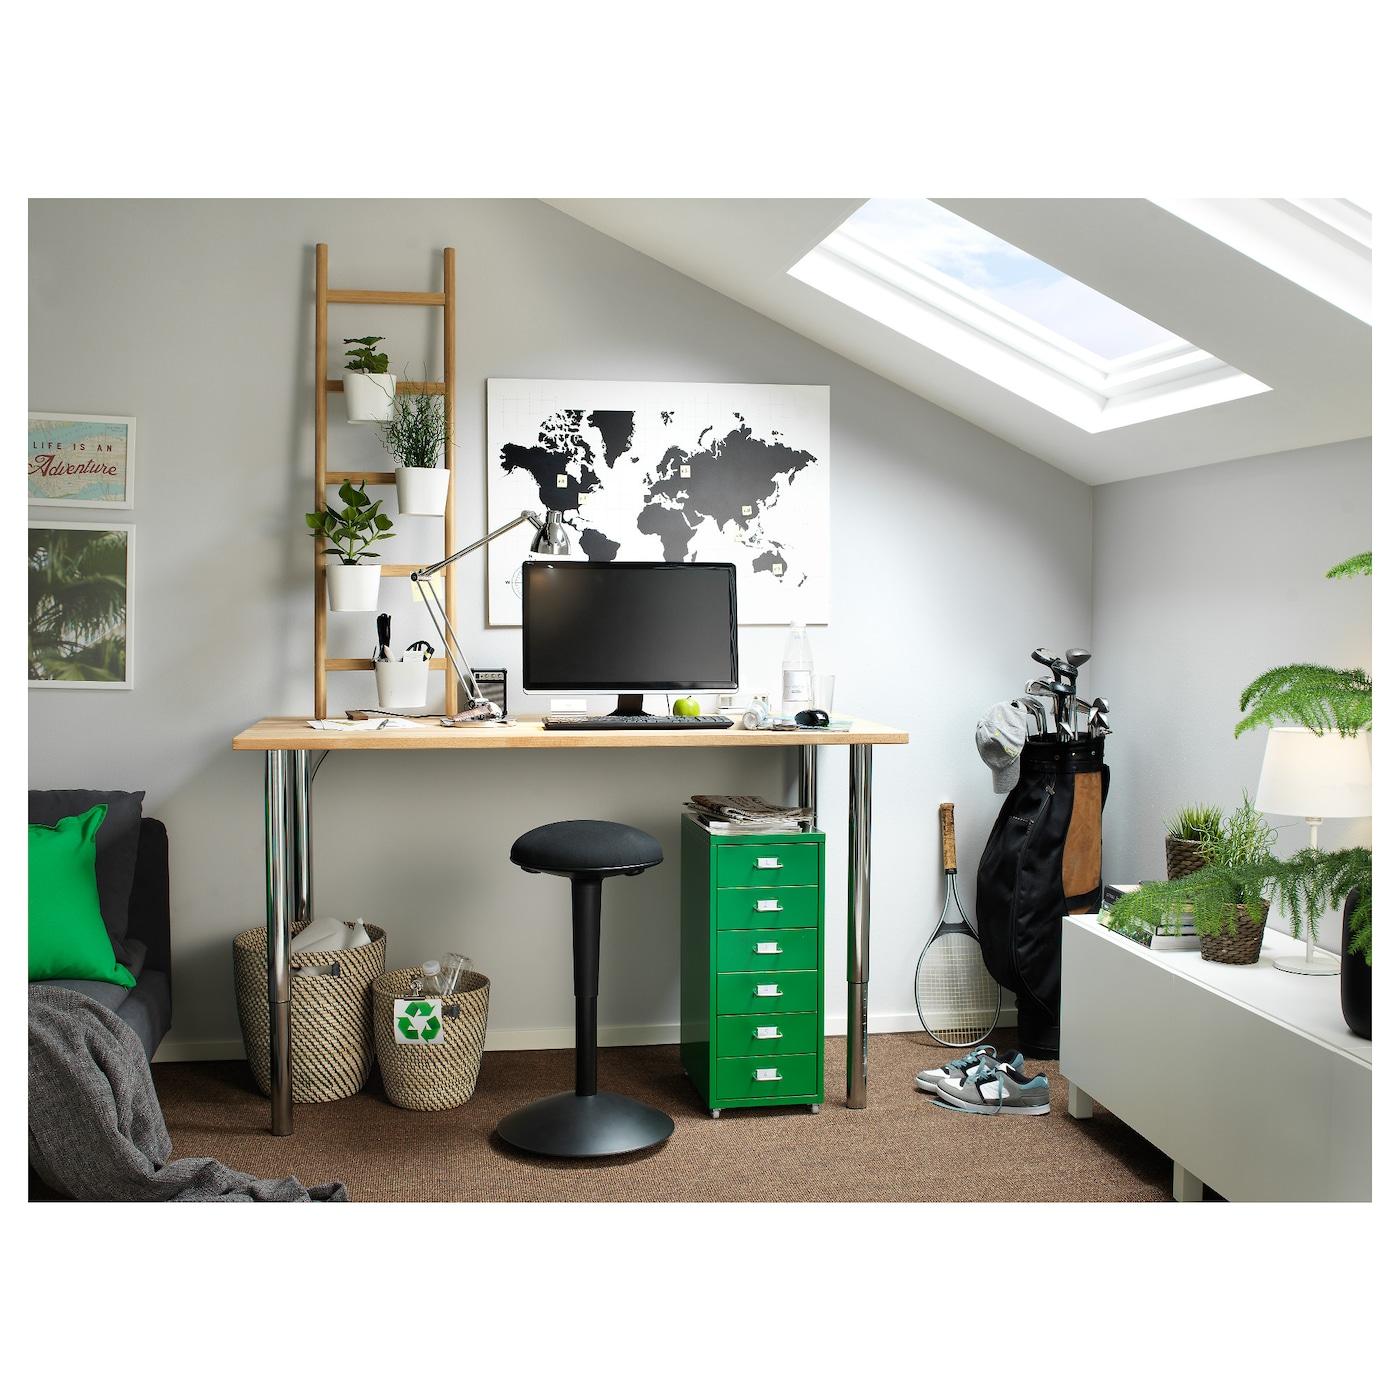 Ikea Ikea Stenstorp Wood Chrome And Black: HELMER Drawer Unit On Castors Green 28x69 Cm